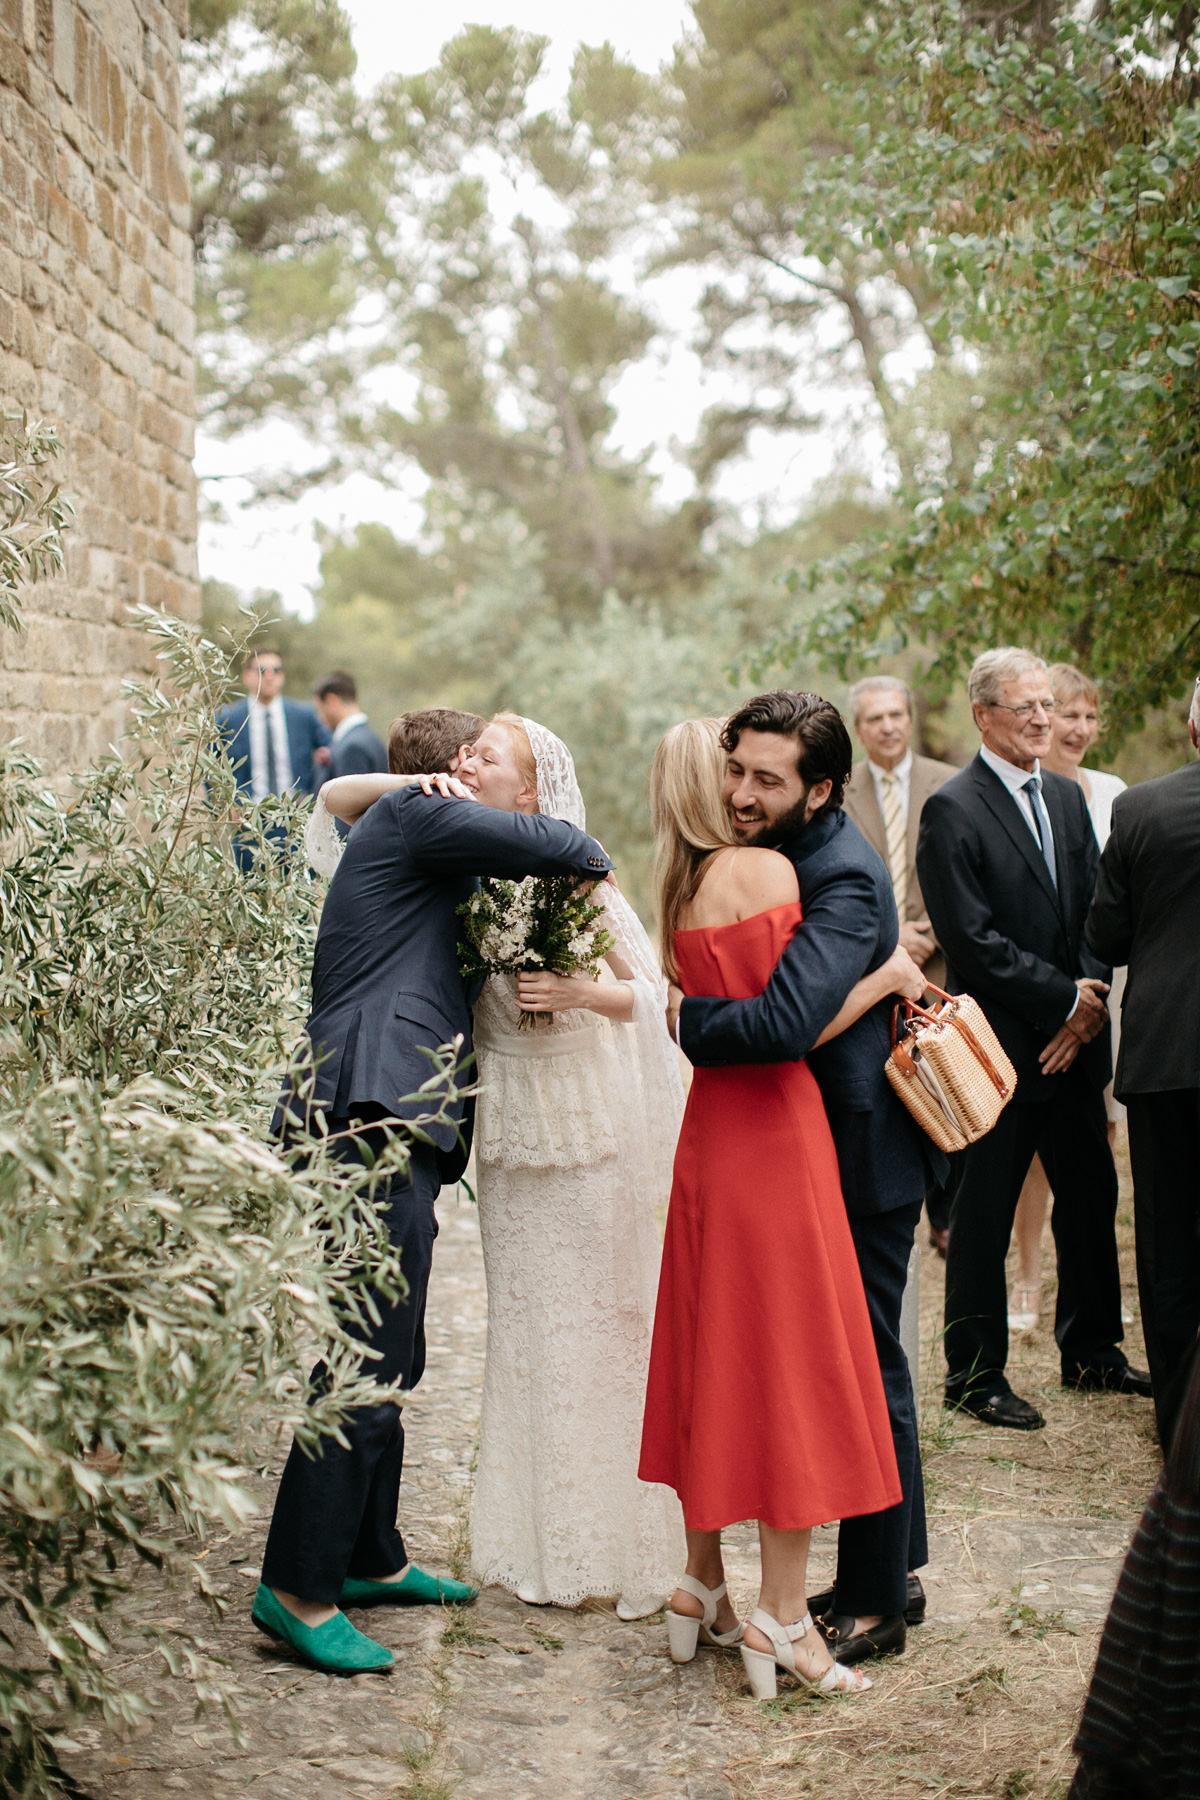 213-lifestories-photography-wedding-Frances-Jonah-2017-_MG_2794